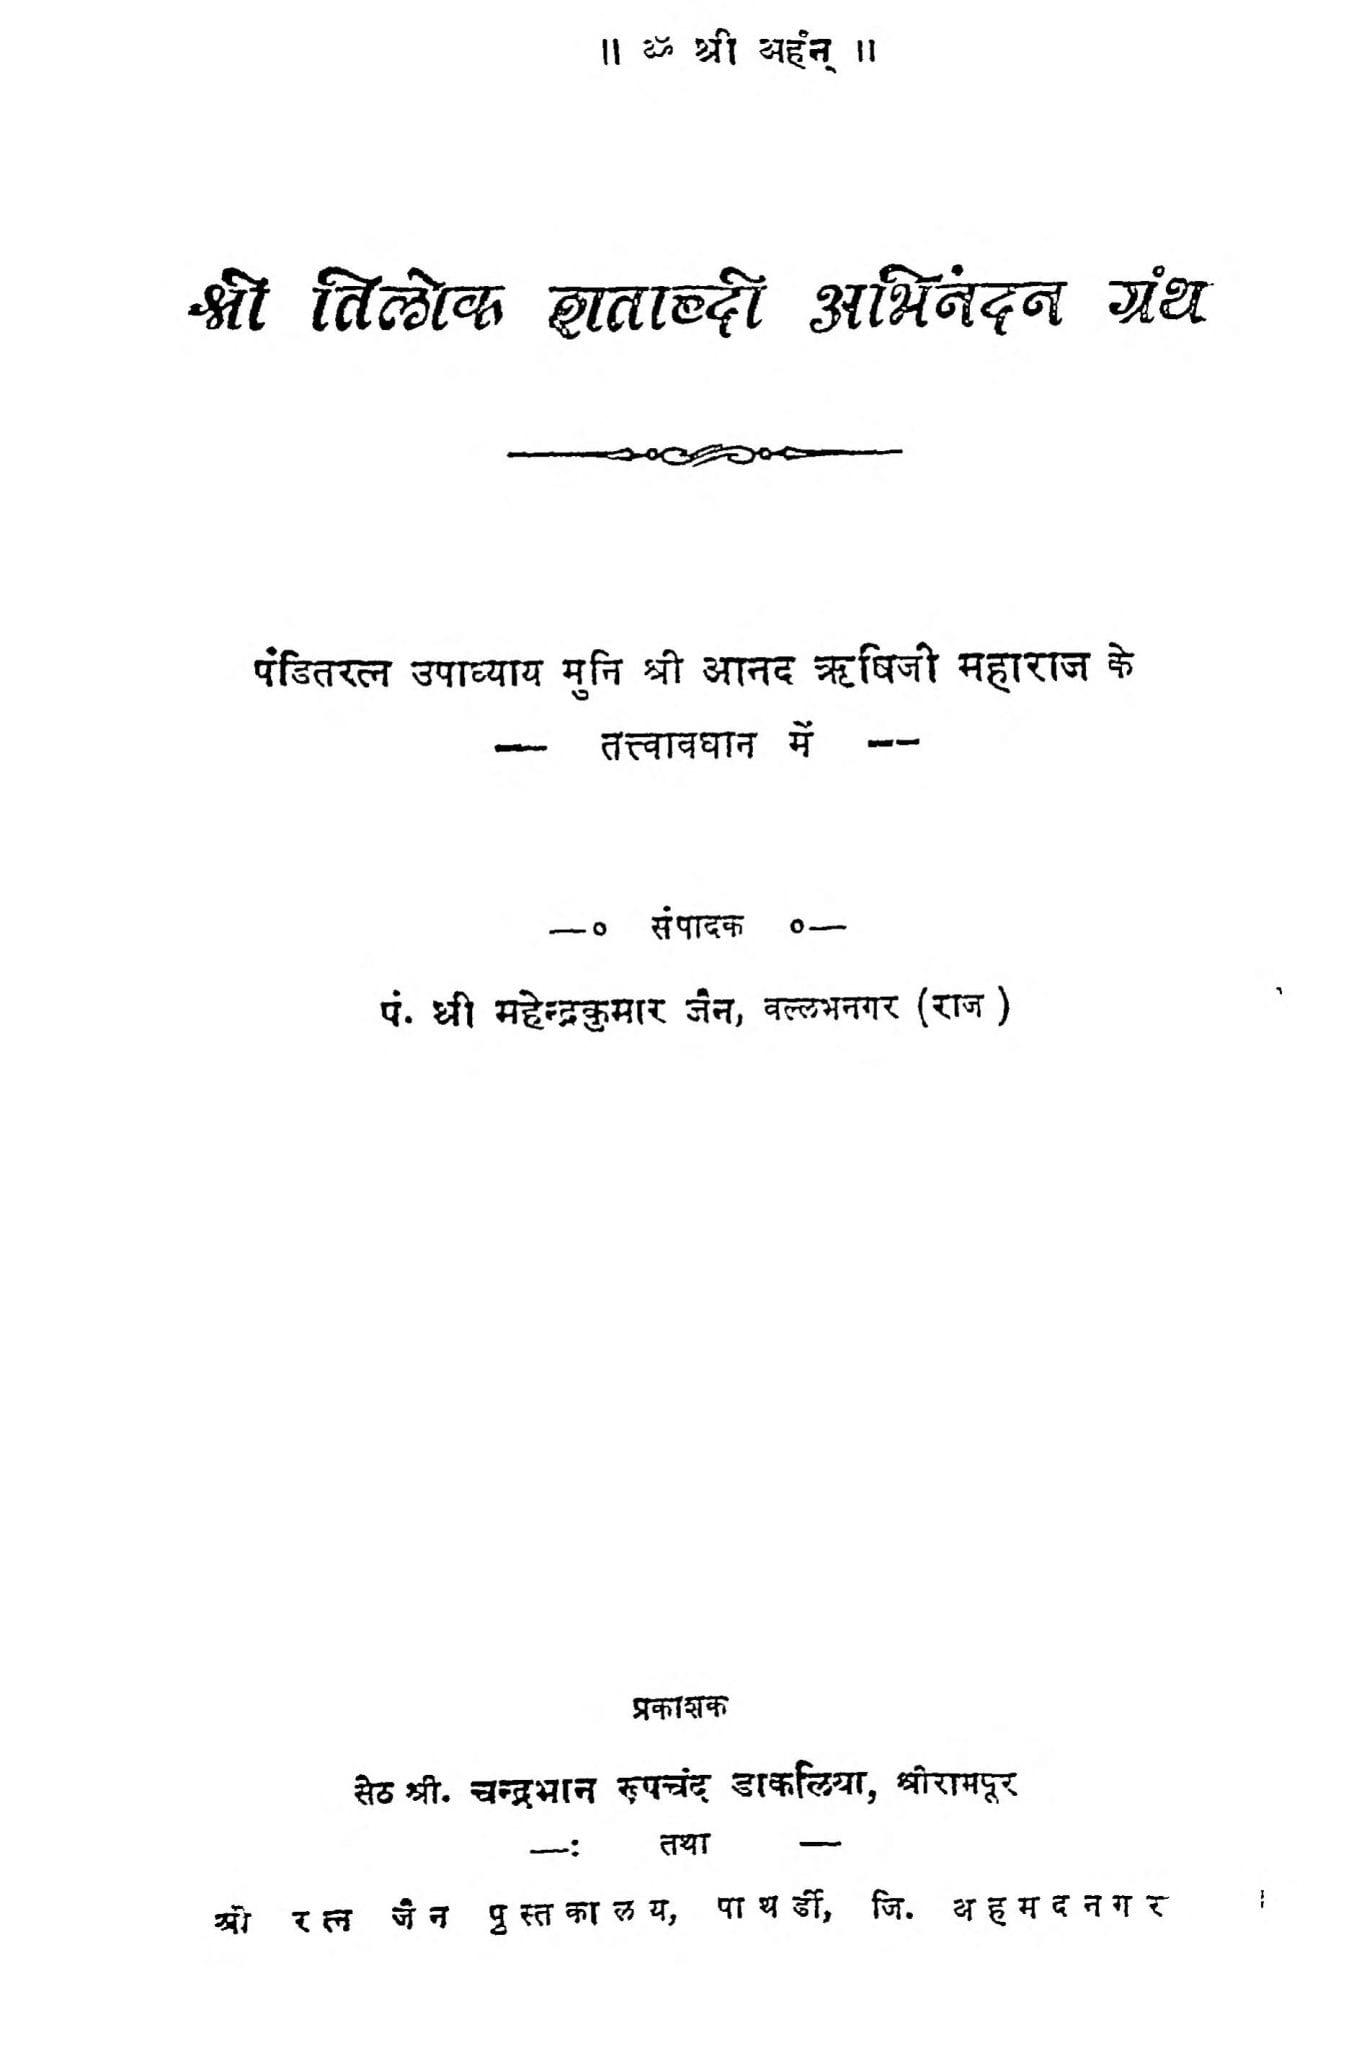 Book Image : श्री तिलोक शताब्दी अभिनंदन ग्रंथ - Shree Tilok Shatabdi Abhinandan Granth